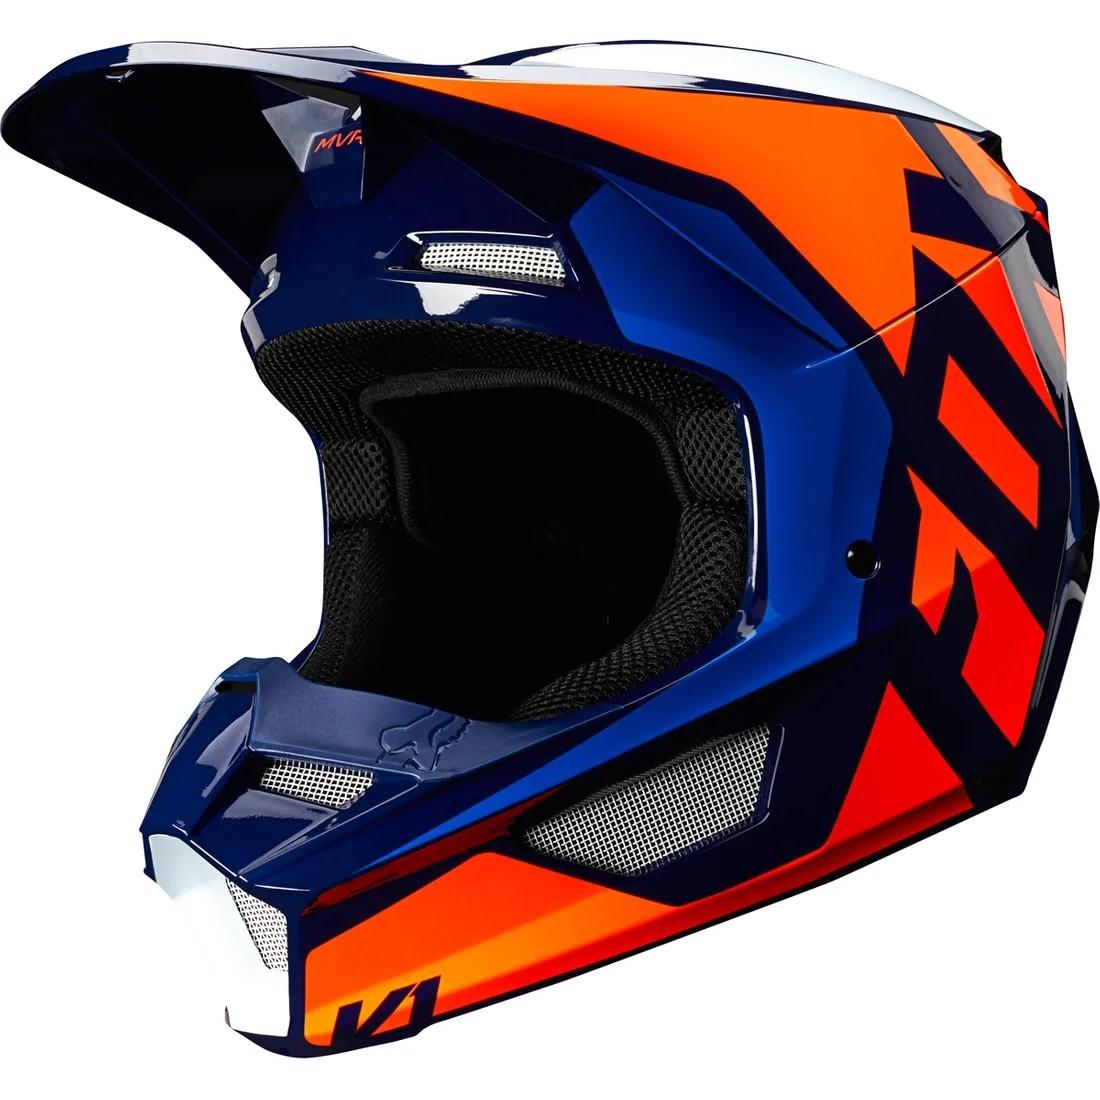 Capacete FOX V1 MVRS PRIX - Laranja/Azul